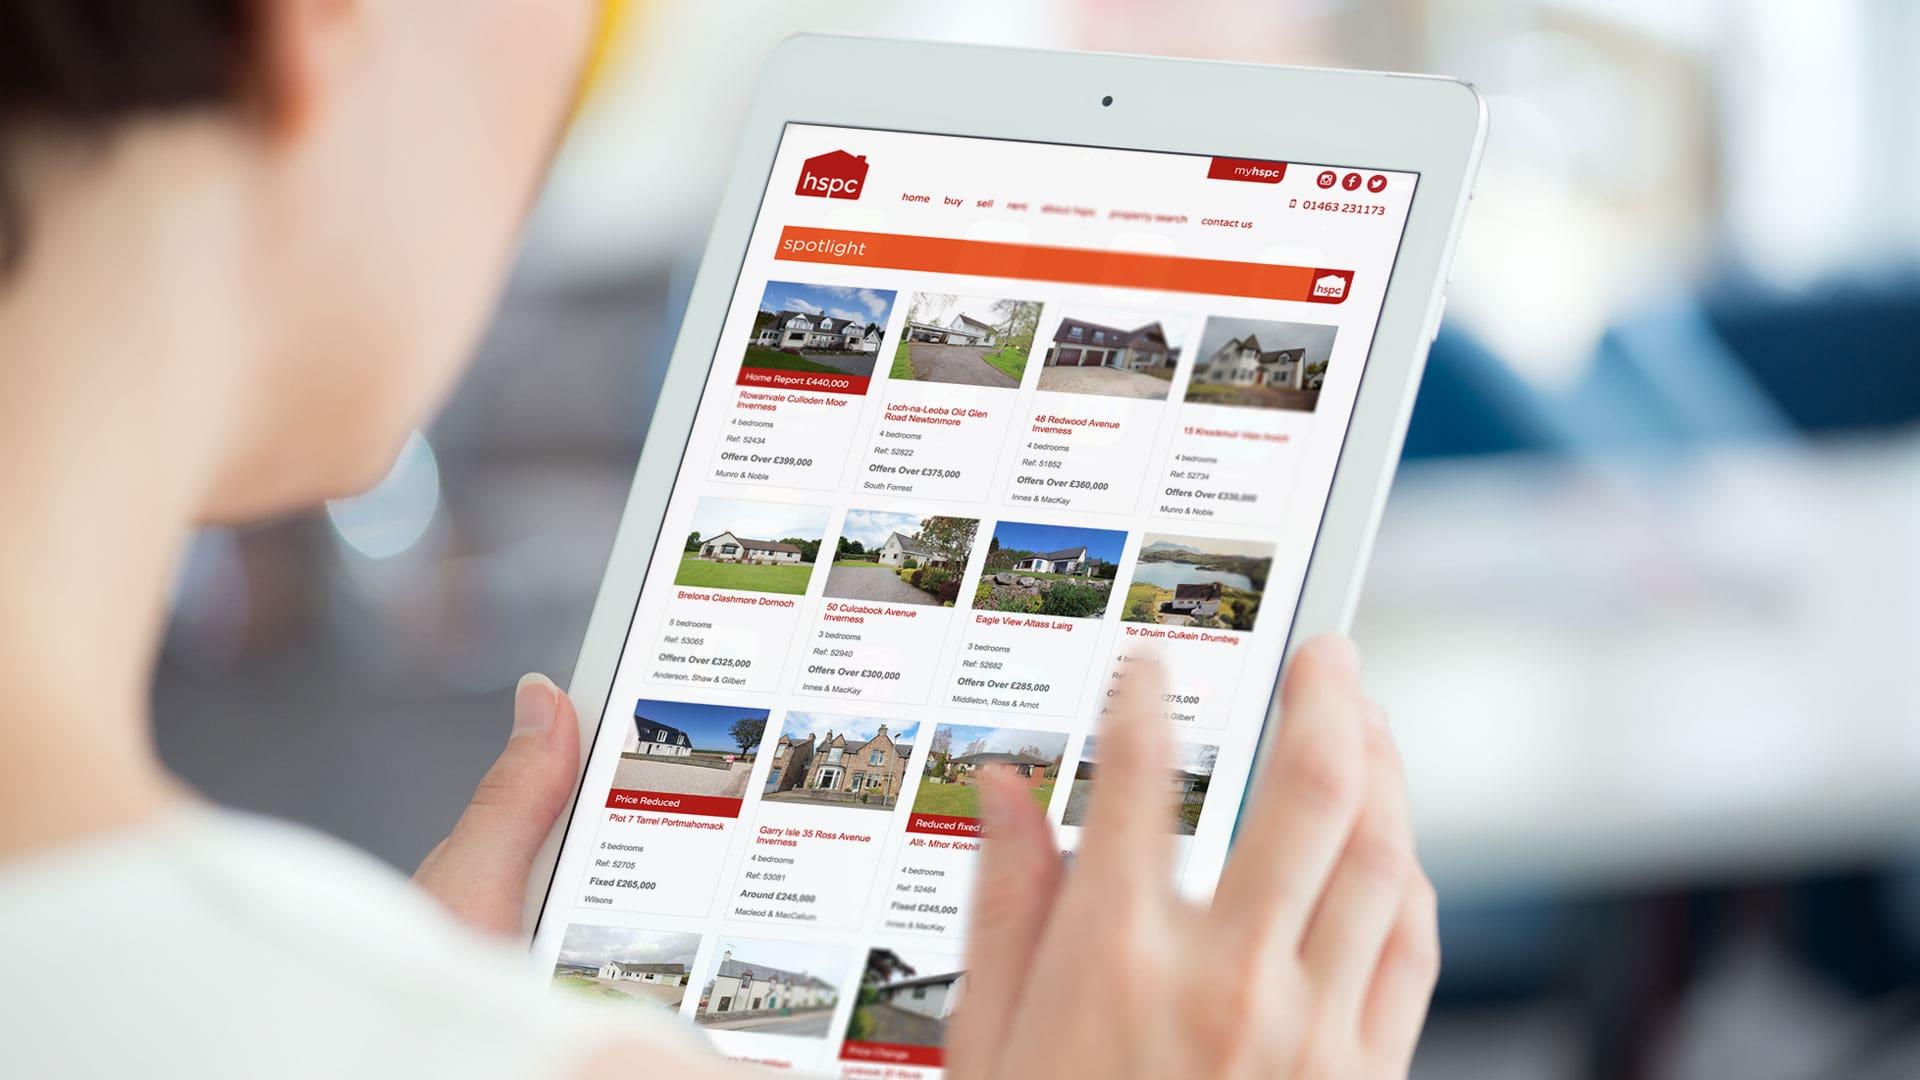 hspc website on a tablet